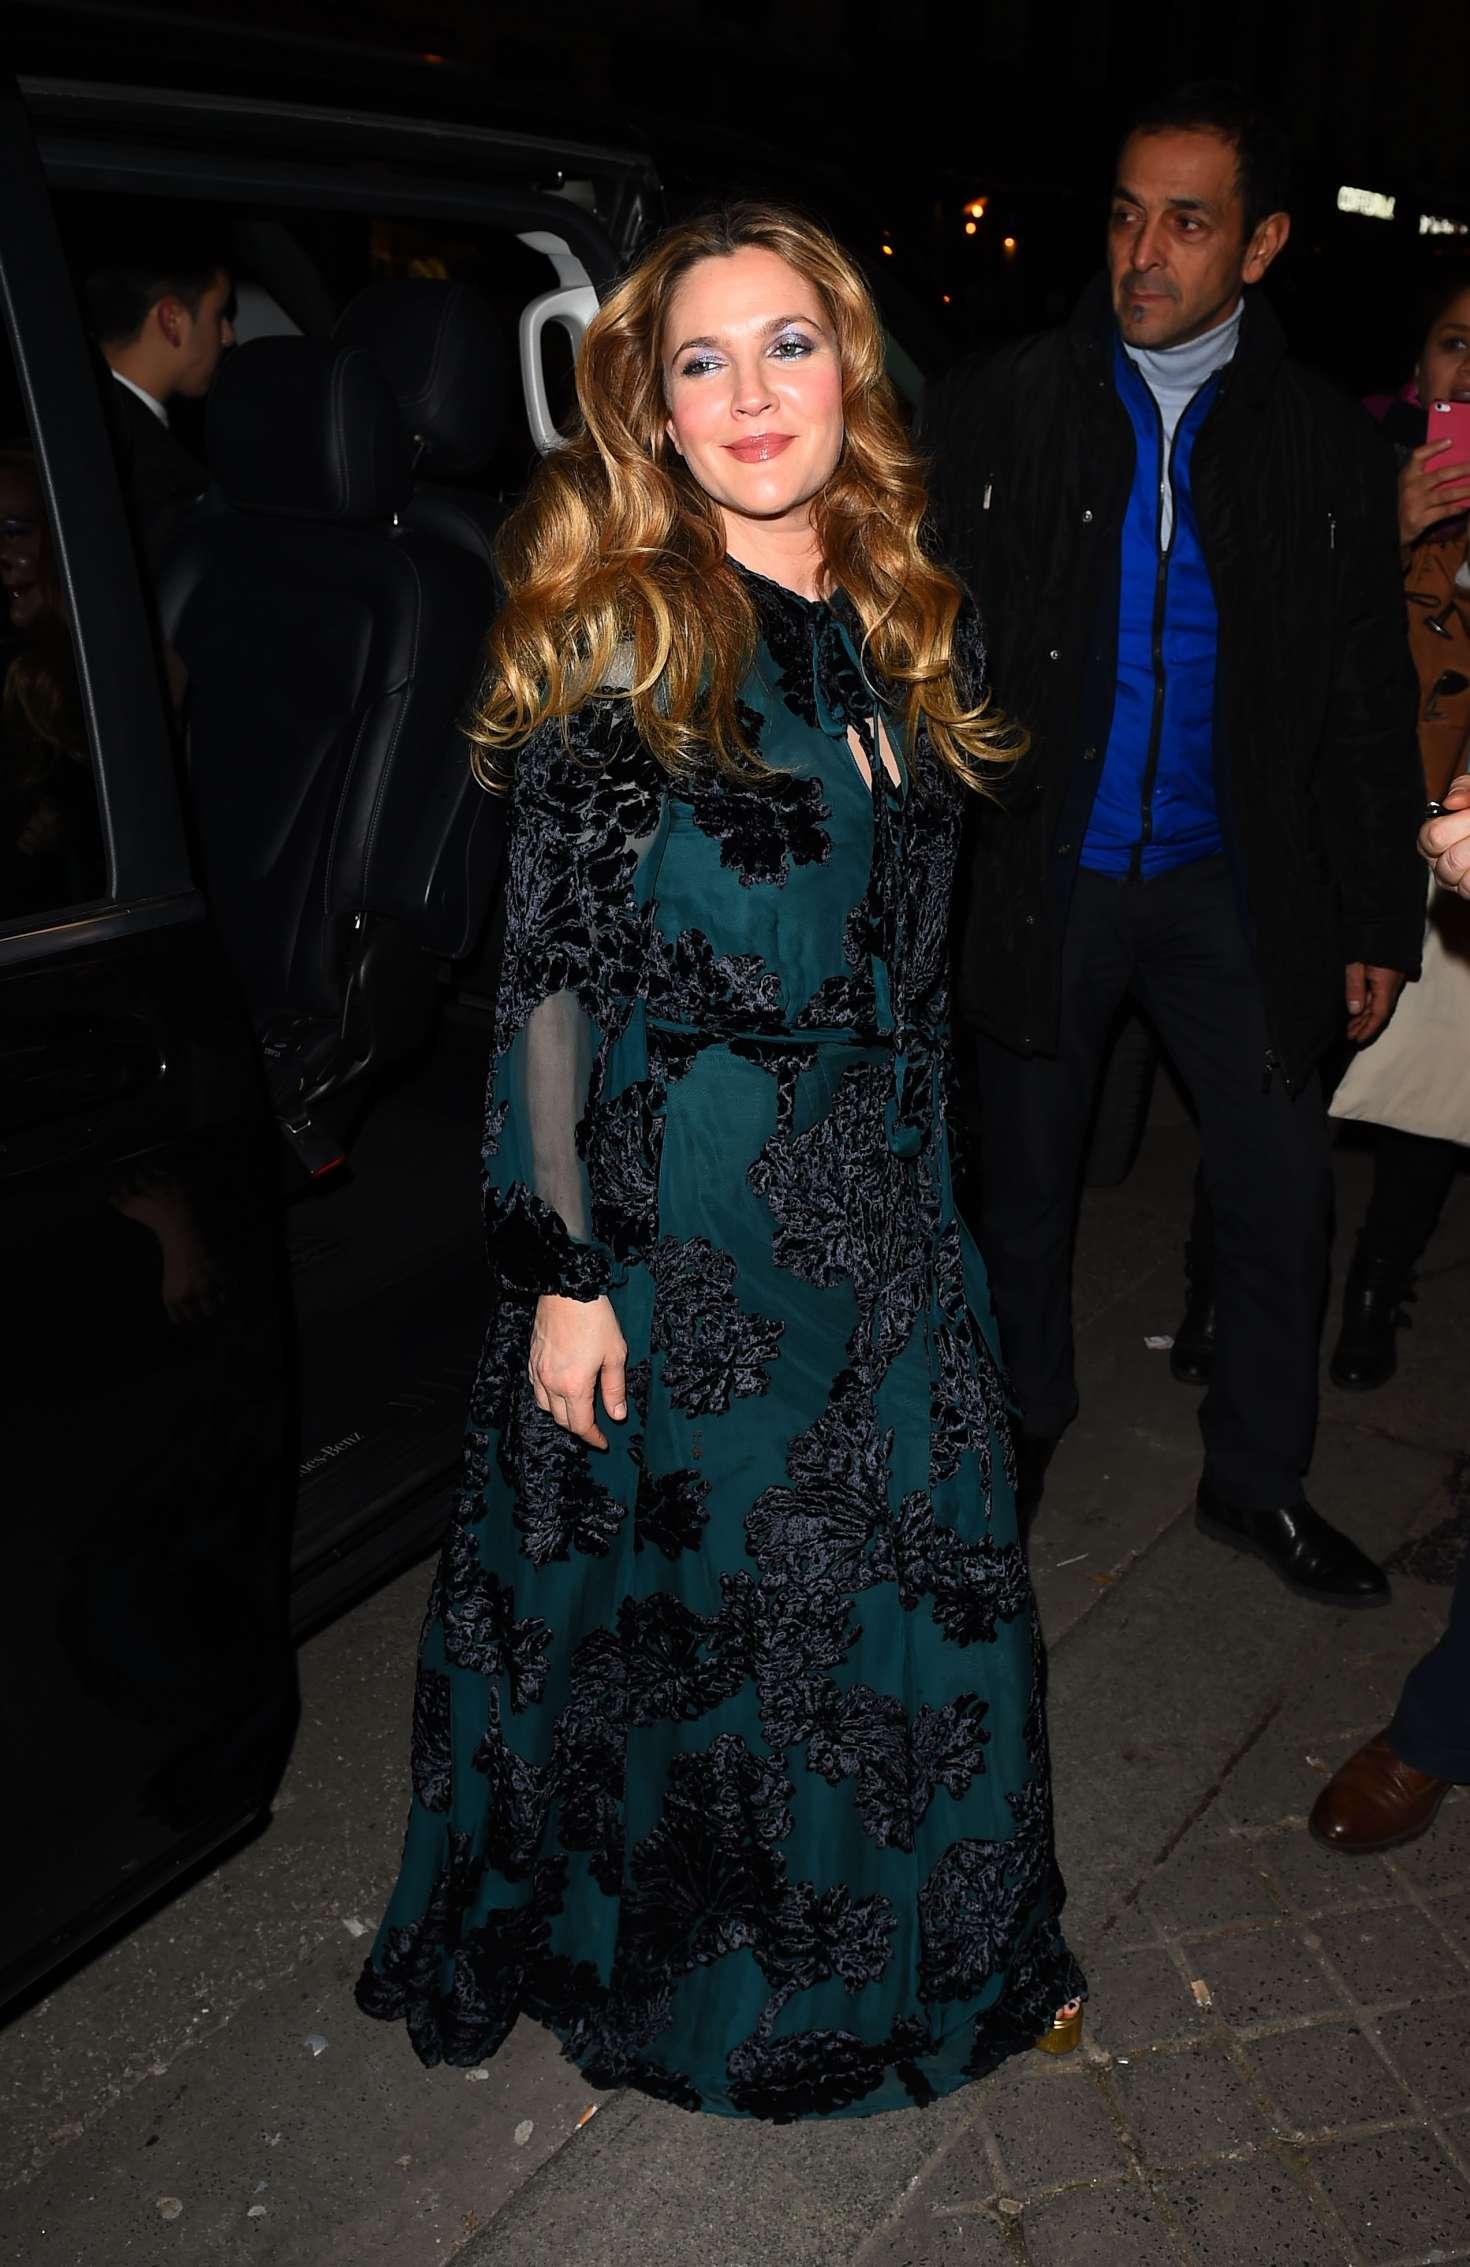 Drew Barrymore 2017 : Drew Barrymore: Arrives at C A Vous TV Show -03